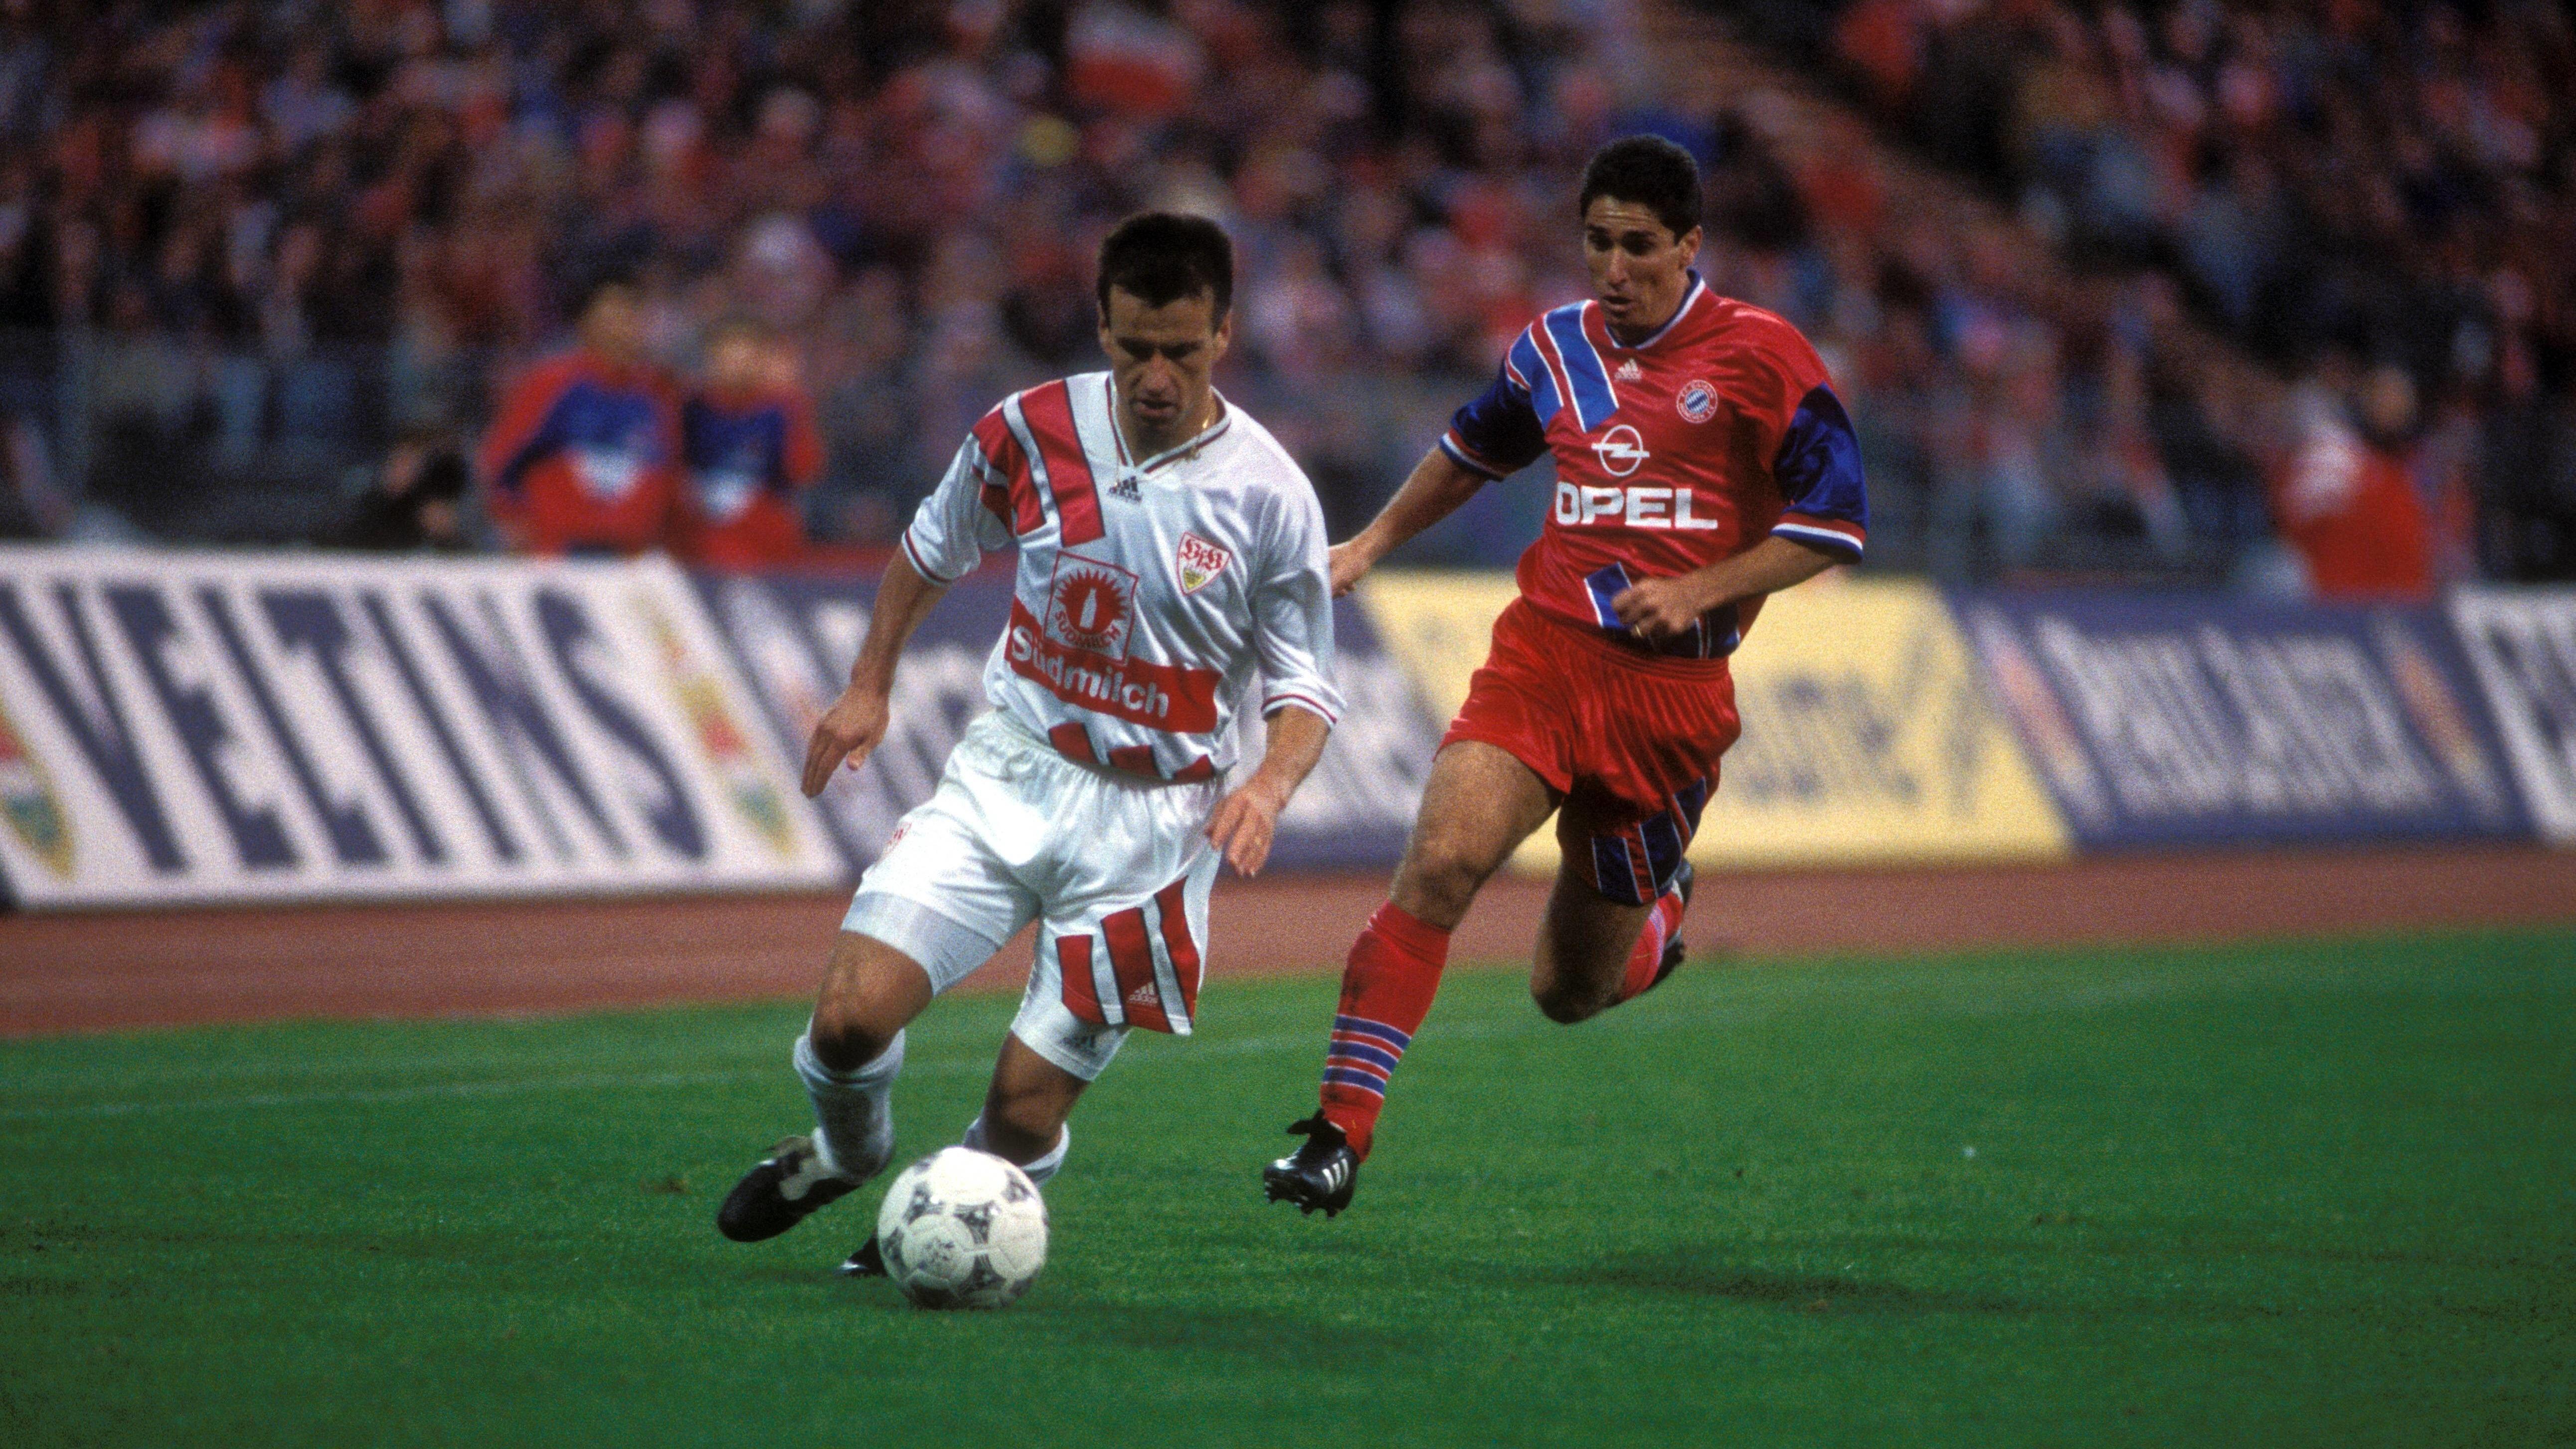 Brasilianische Weltklasse in der Bundesliga: Carlos Dunga (li. am Ball) daneben Jorginho